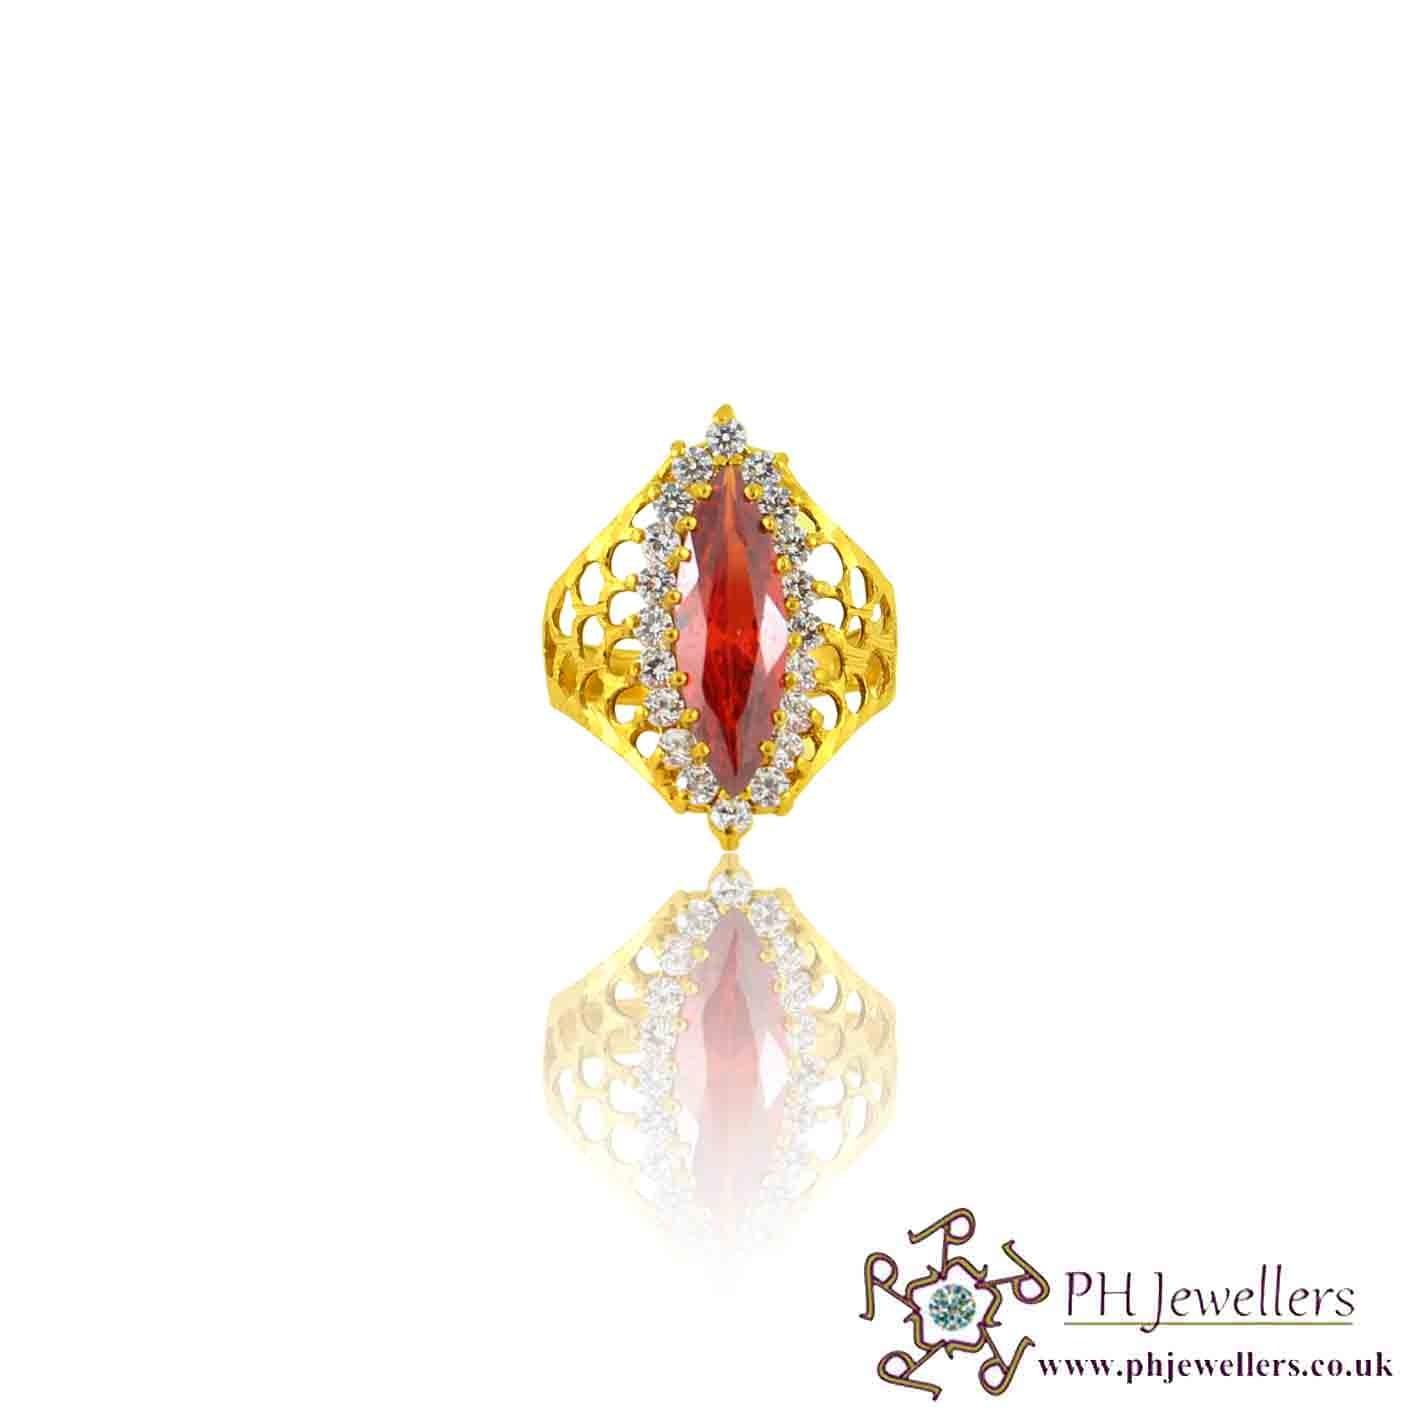 22ct 916 Yellow Gold Hallmark Marquise Garnet Ring CZ Size P 1/2,Q,R SR114